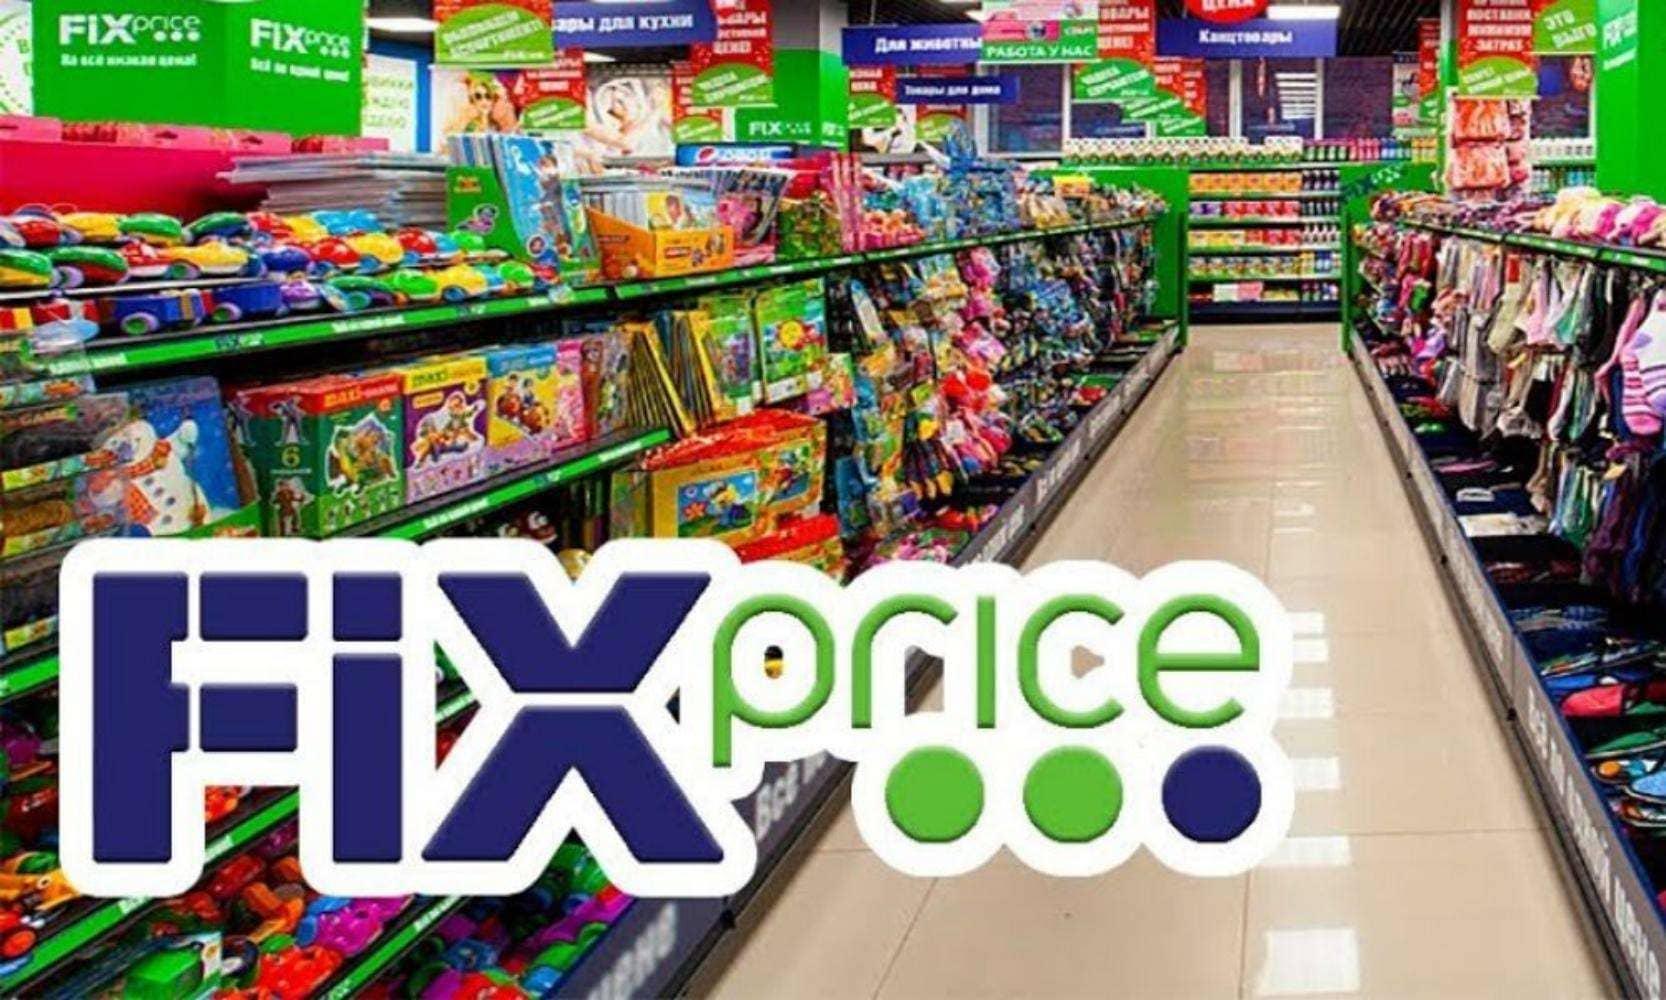 О предприятии Fix Price